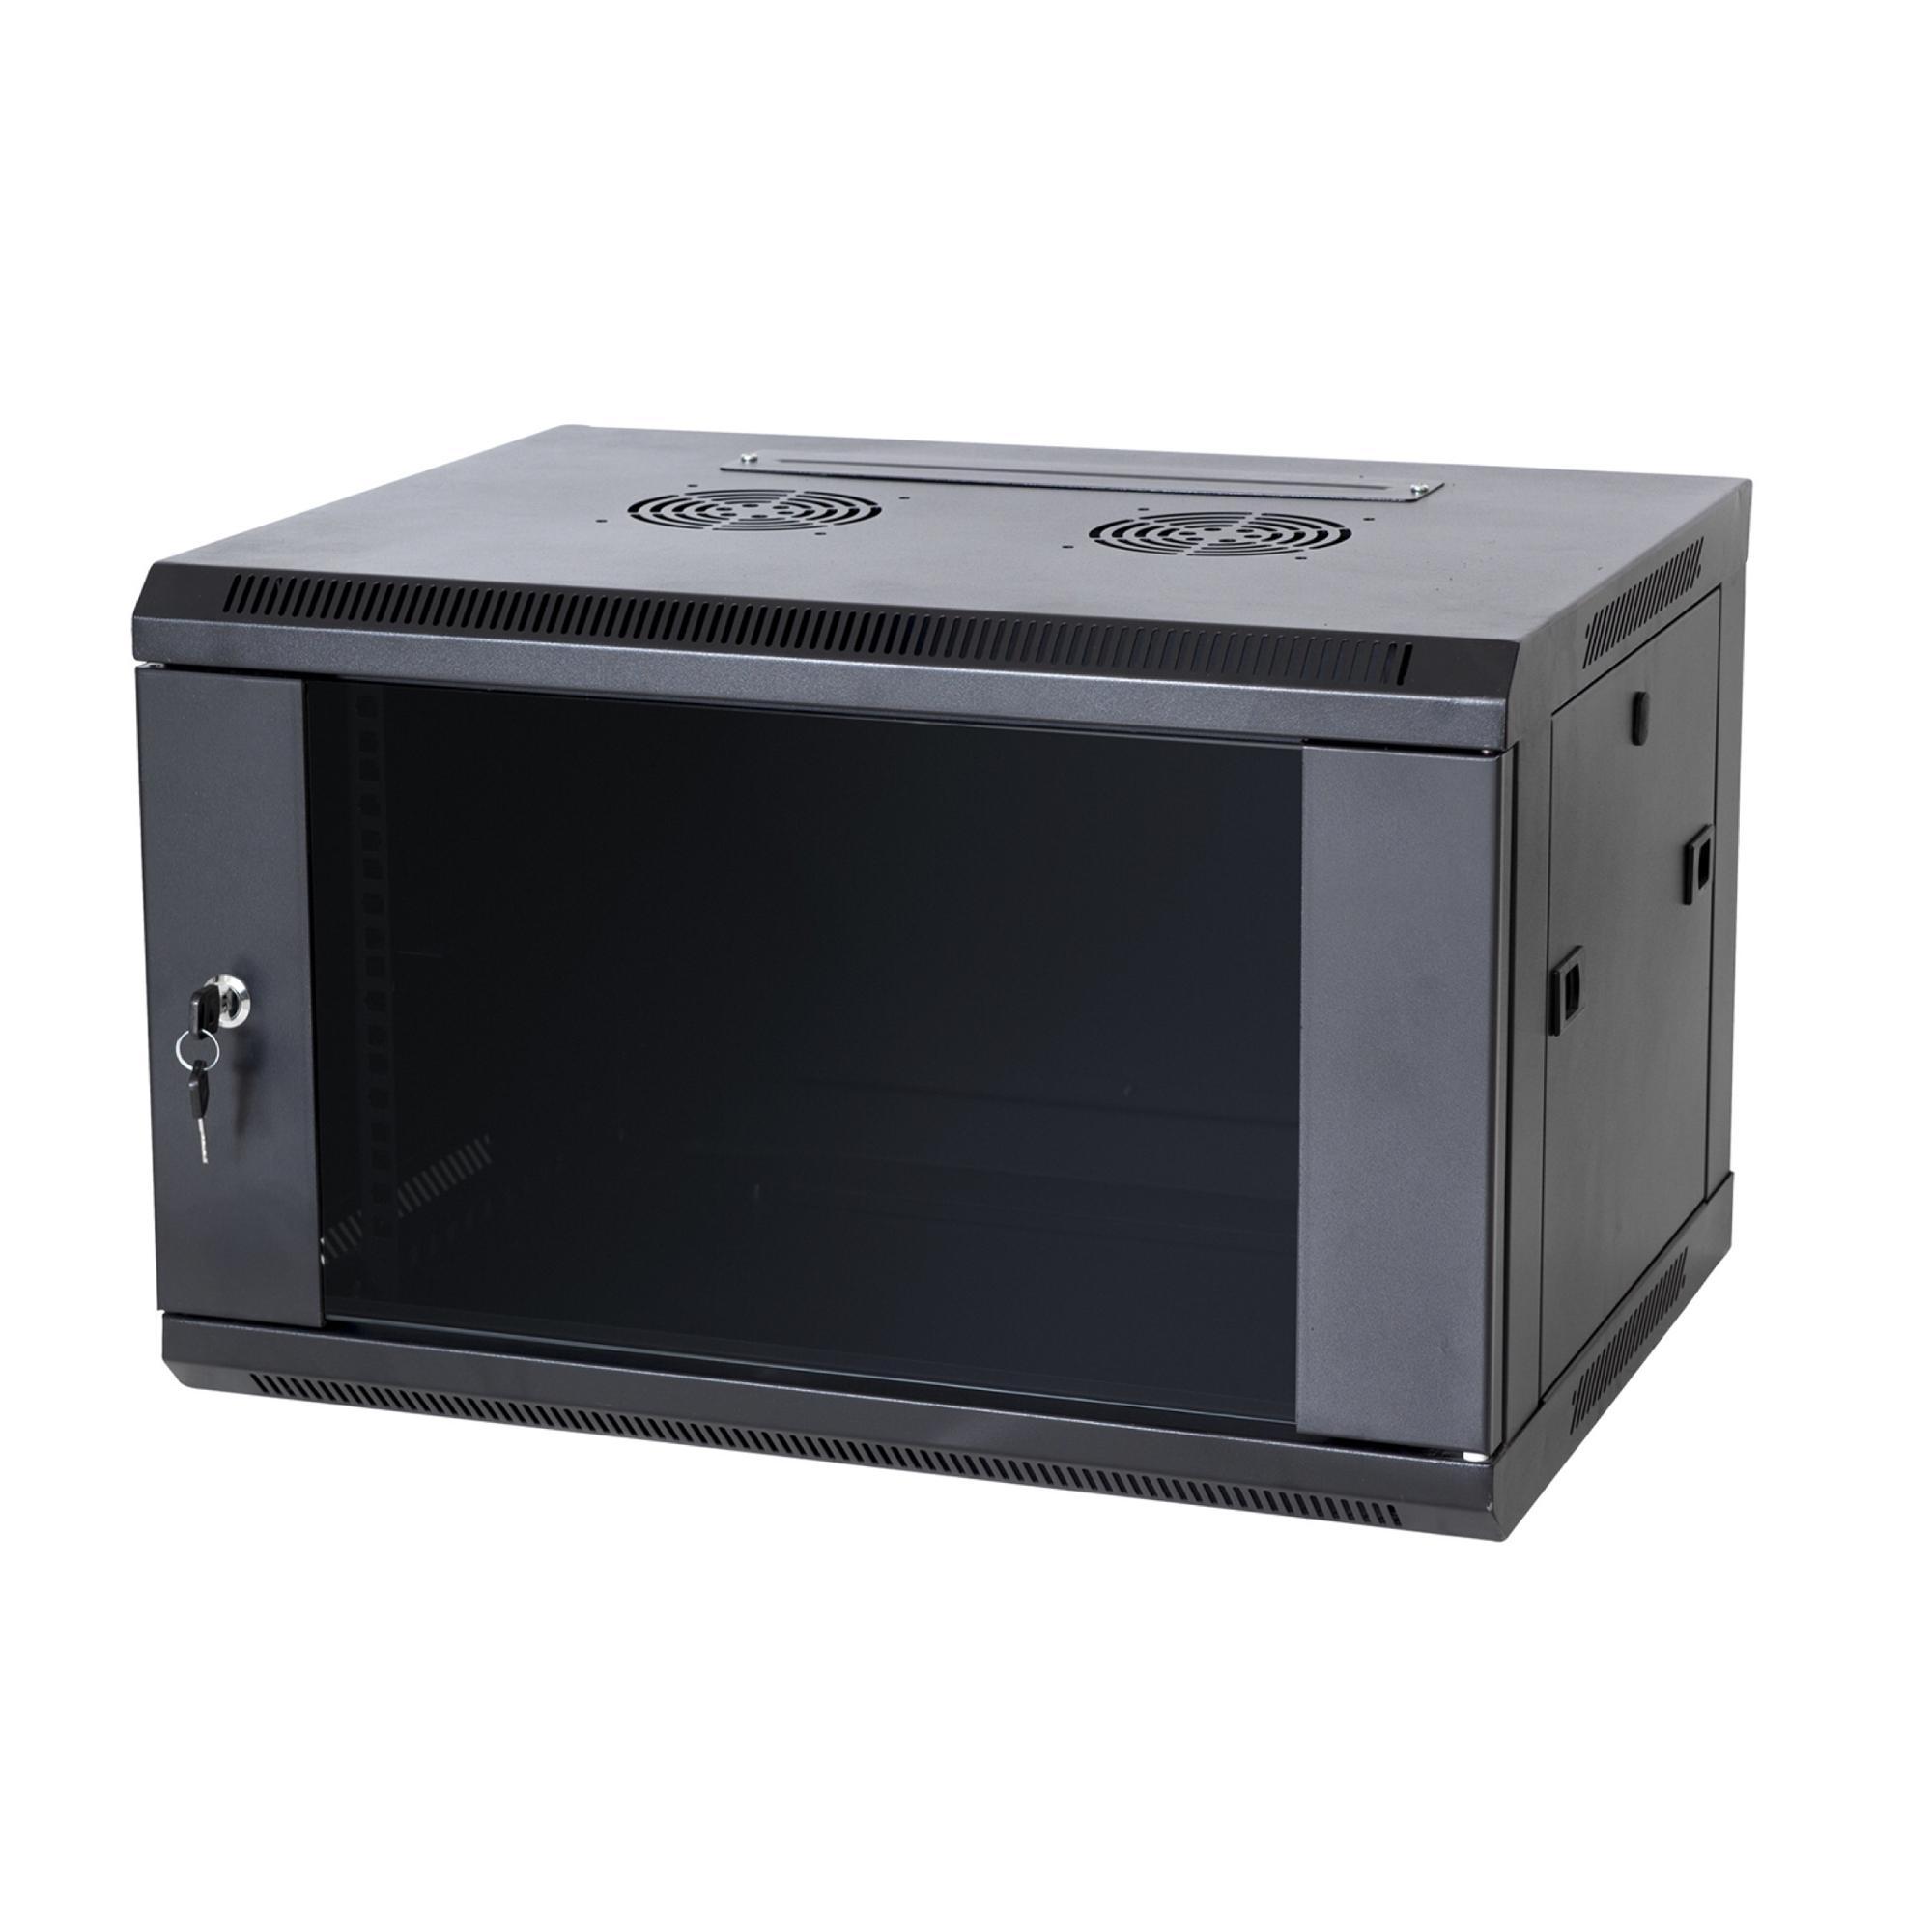 cabinet w fan mount network wall glass door itm lock data rack server enclosure